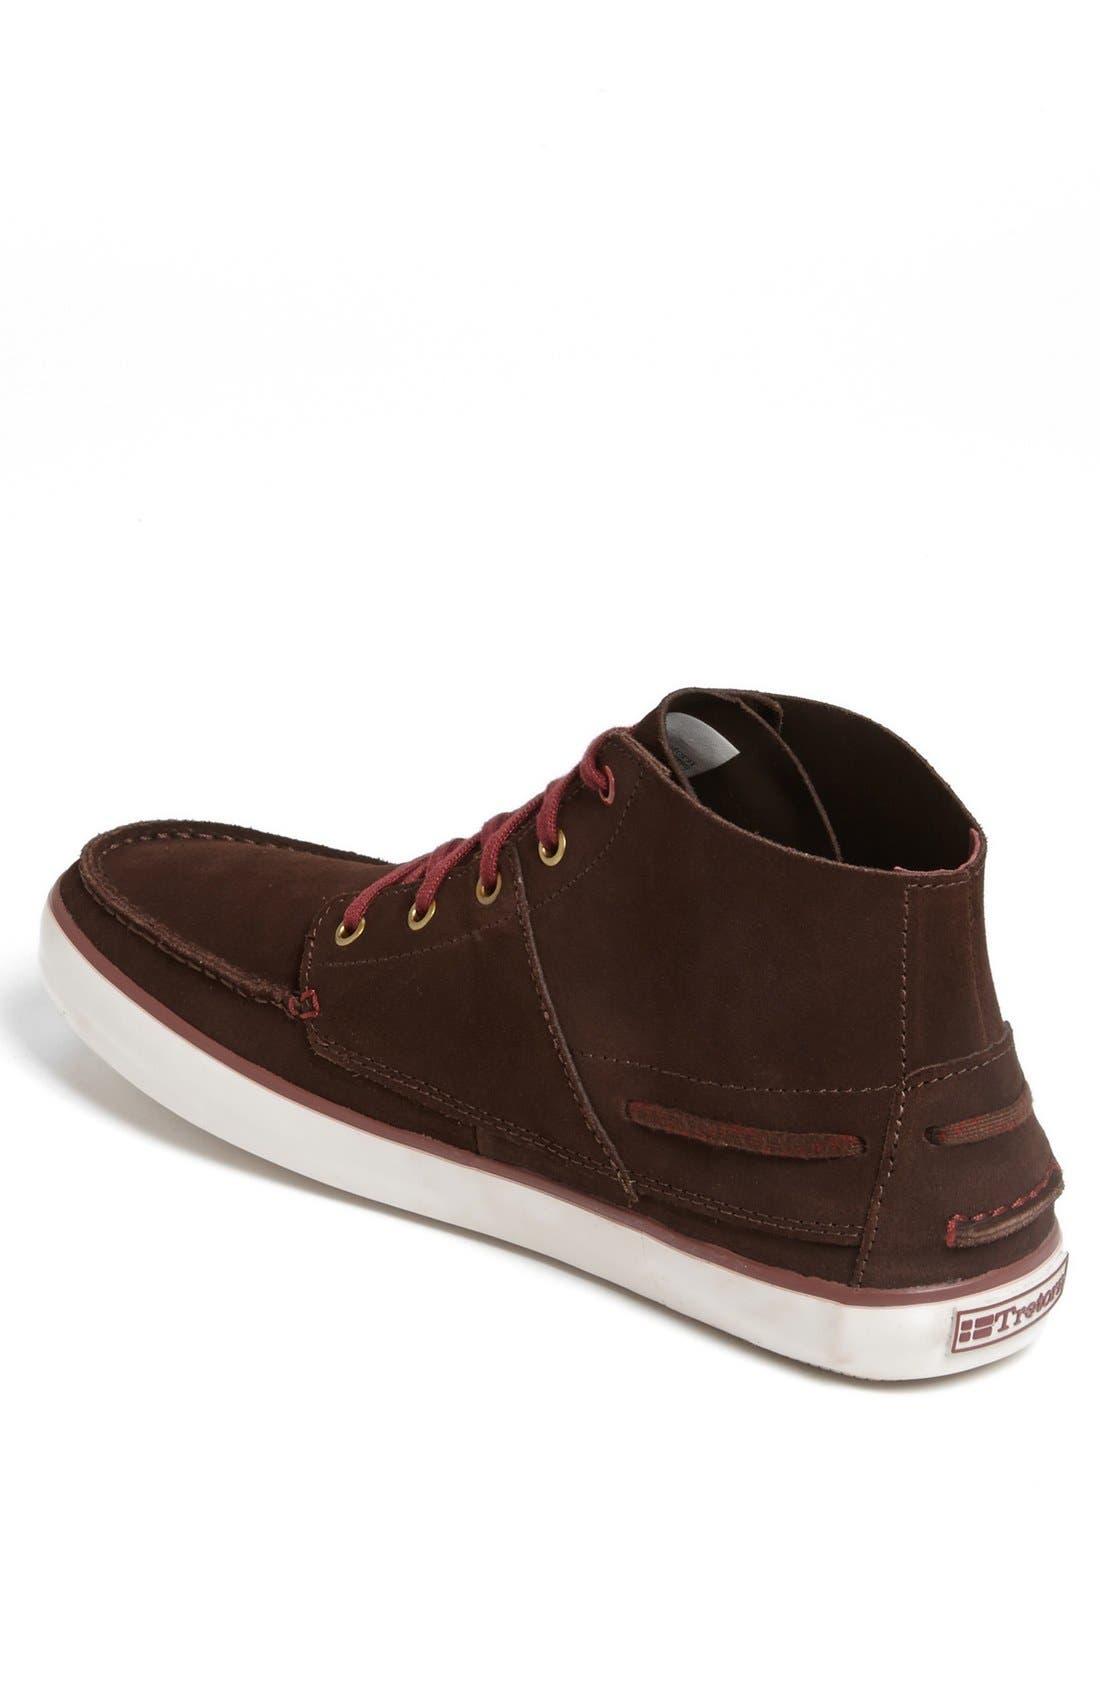 Alternate Image 2  - Tretorn 'Otto Mid' Suede Sneaker (Men)